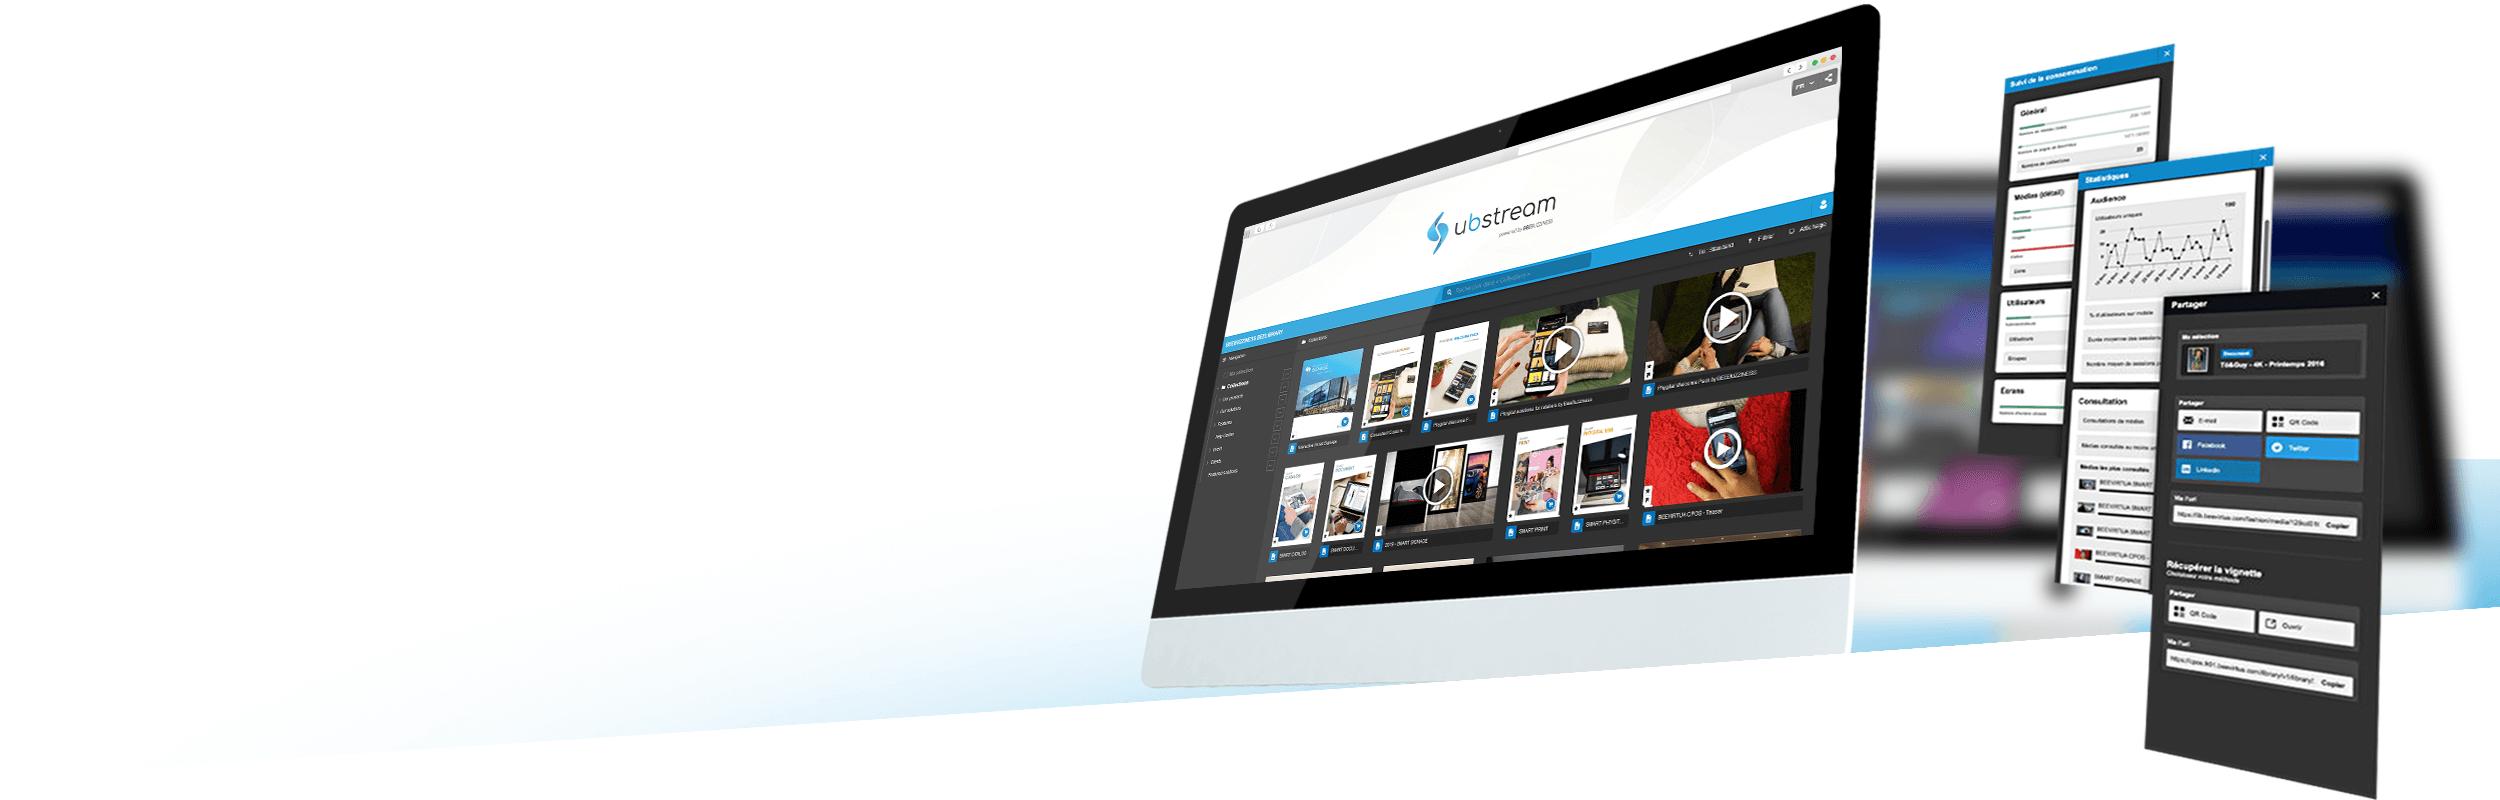 Smart Hub - The first natively omnichannel & phygital hub